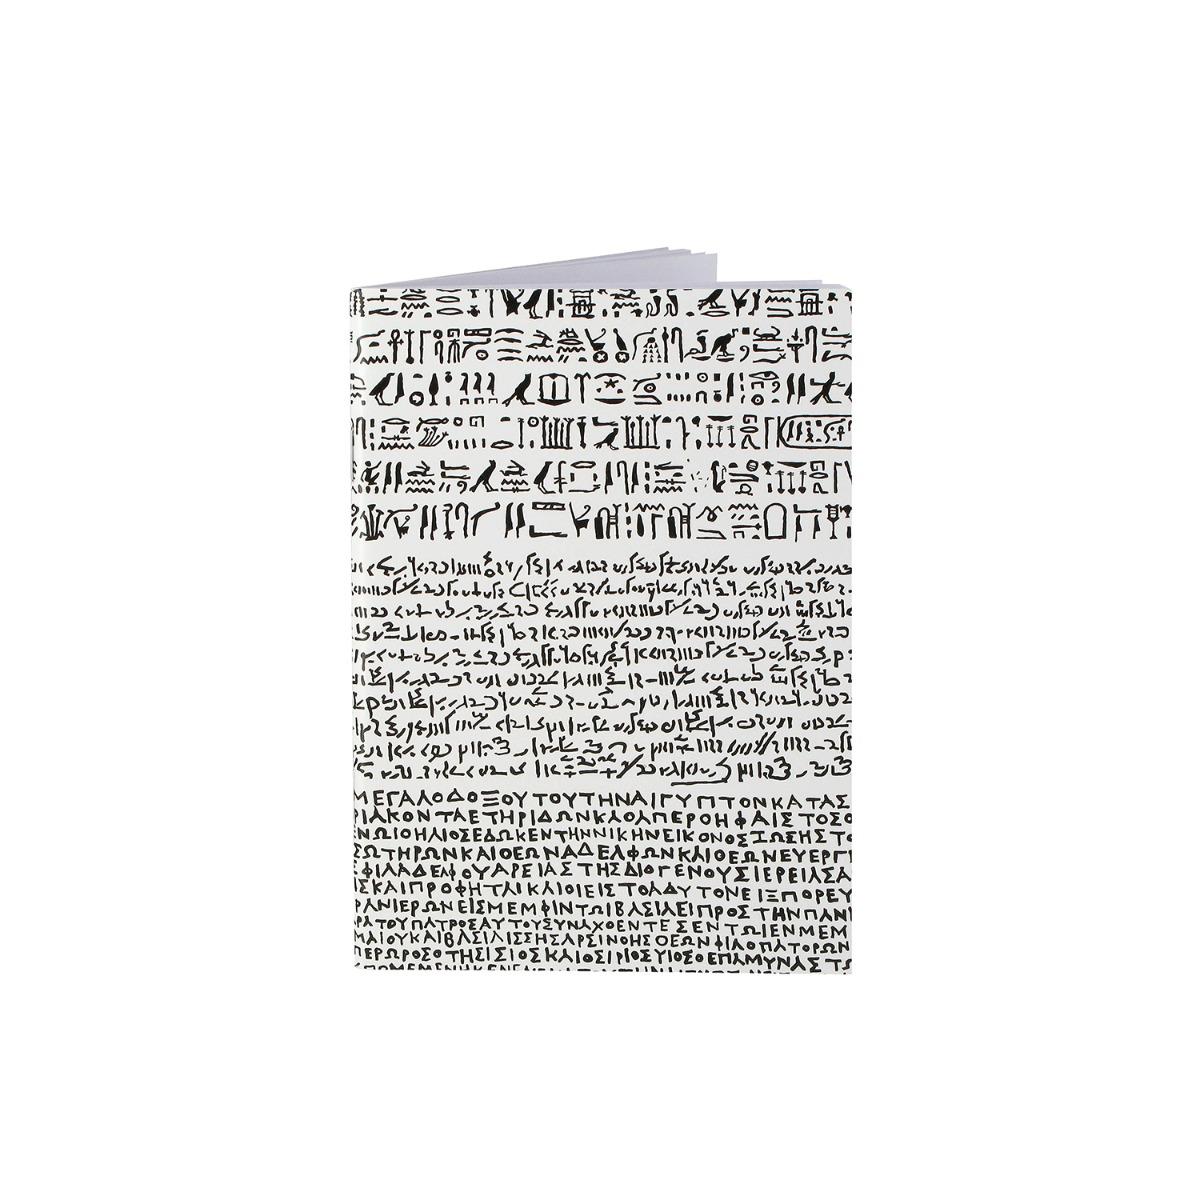 Rosetta Stone notebook (small)